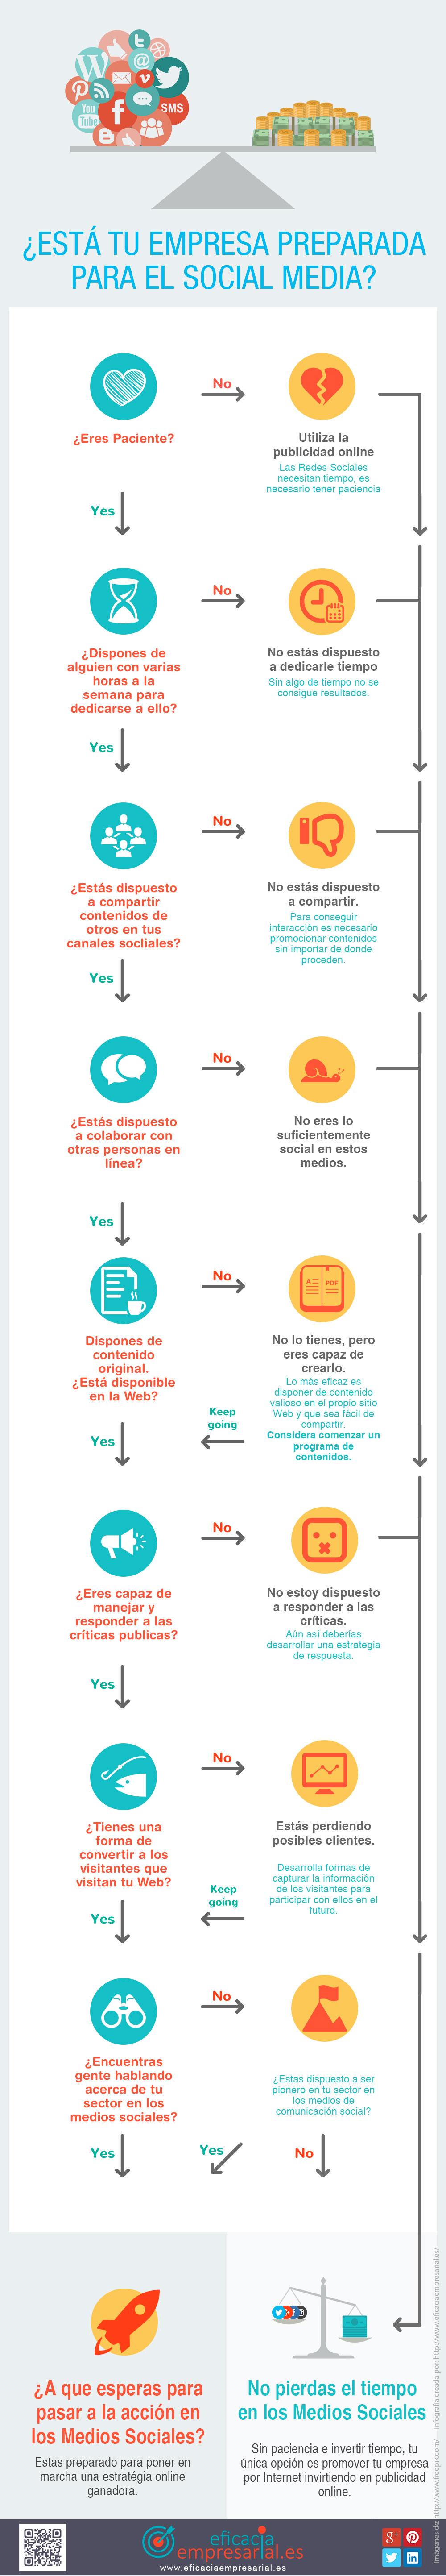 ¿Esta tu empresa preparada para las Redes Sociales? #infografia #infographic #SocialMedia